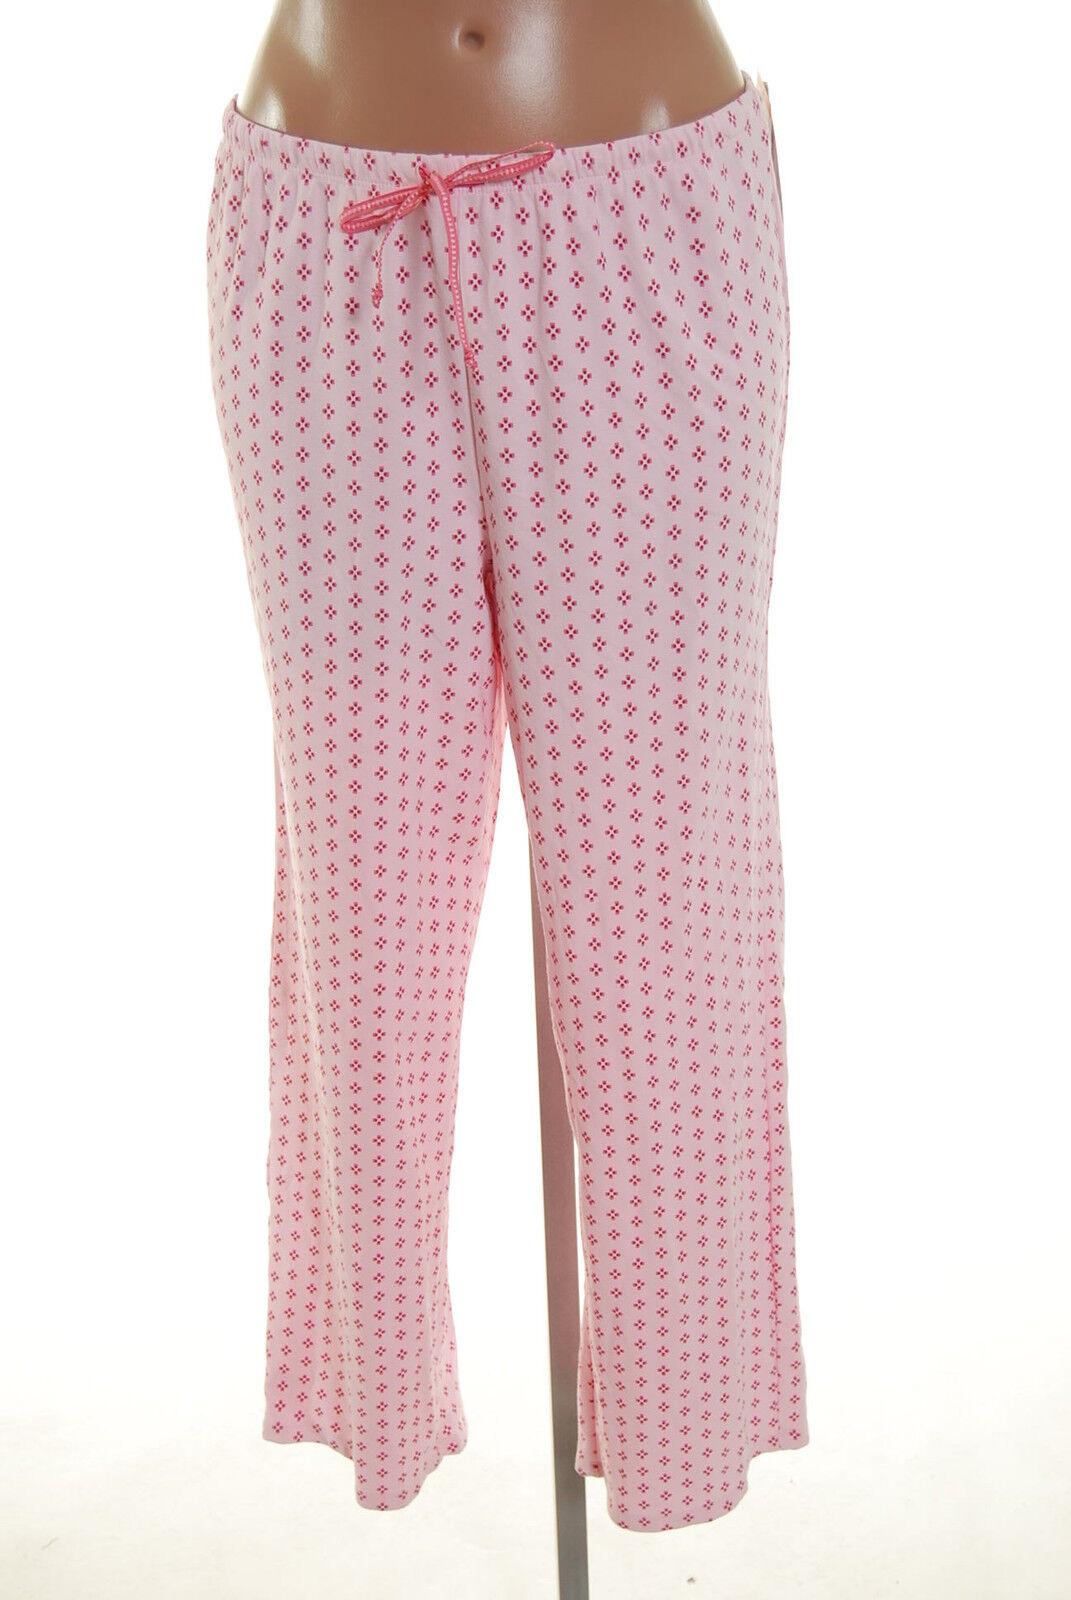 Alfani Intimates Pink Flower Ribbon Lounge Pants Pajama Sleepwear